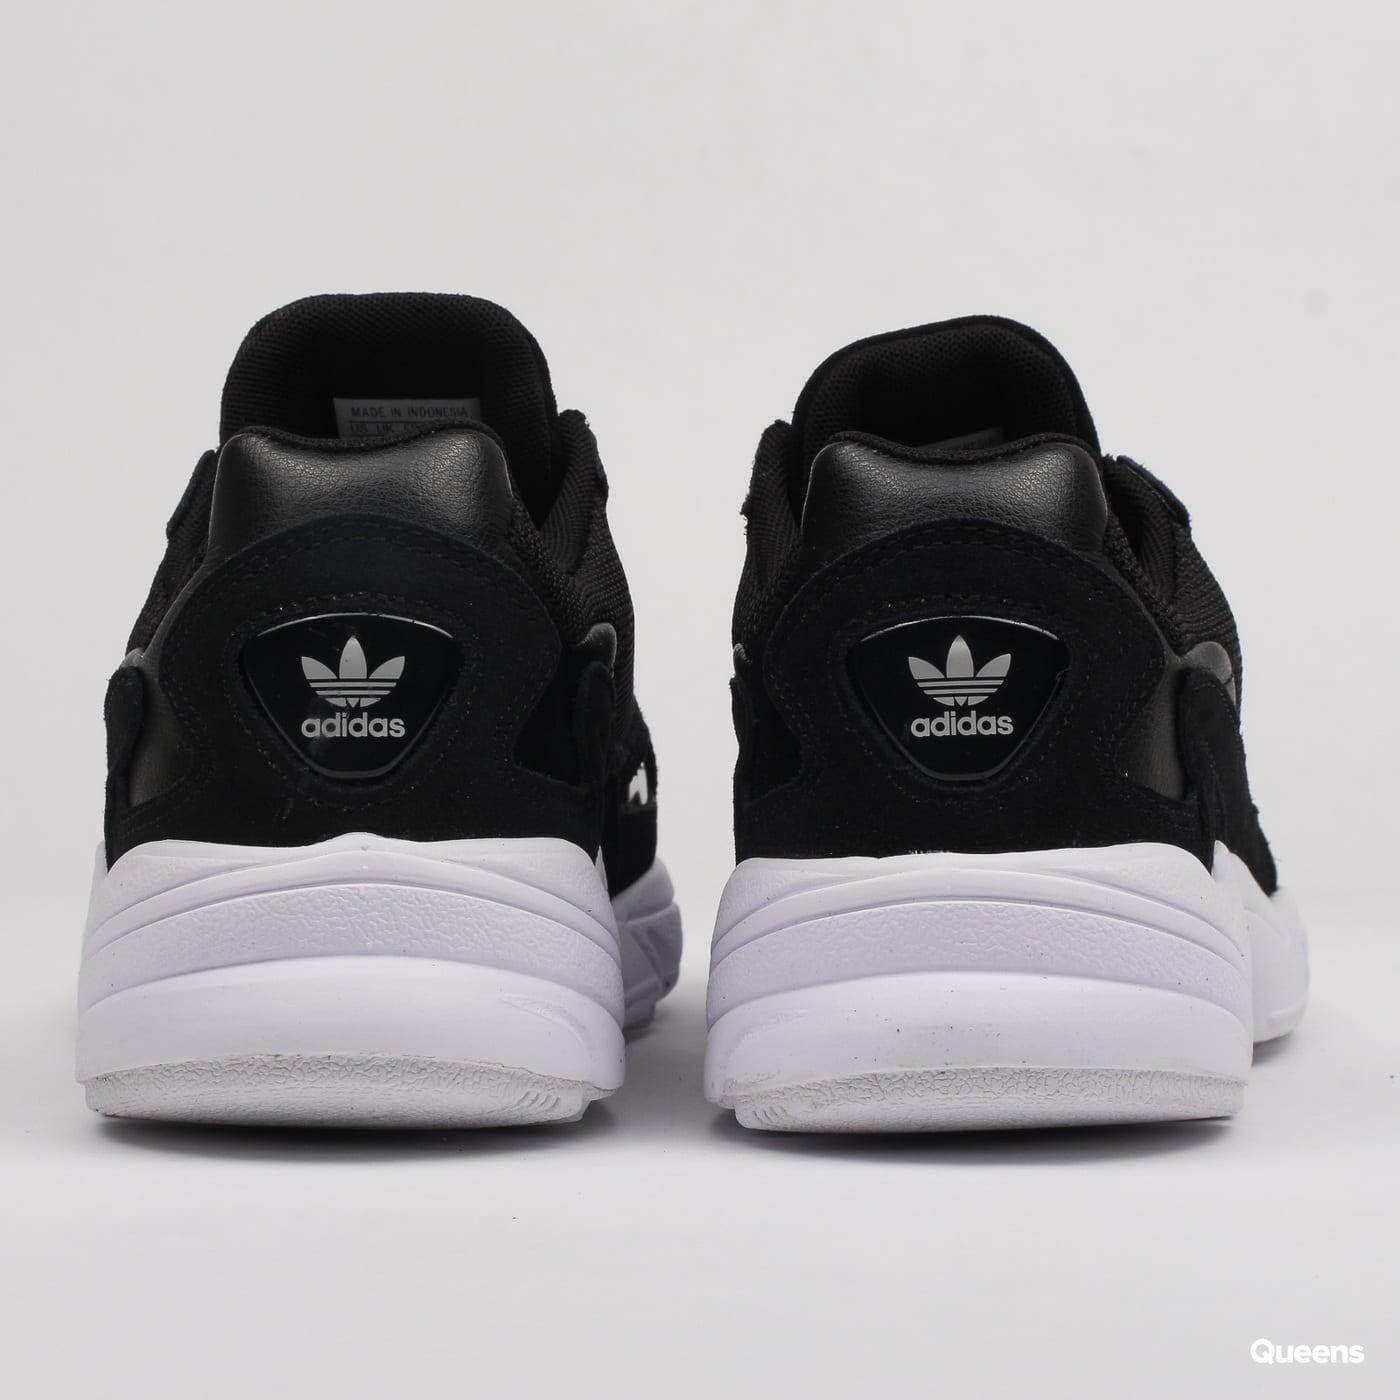 adidas Originals Falcon W cblack / cblack / ftwwht